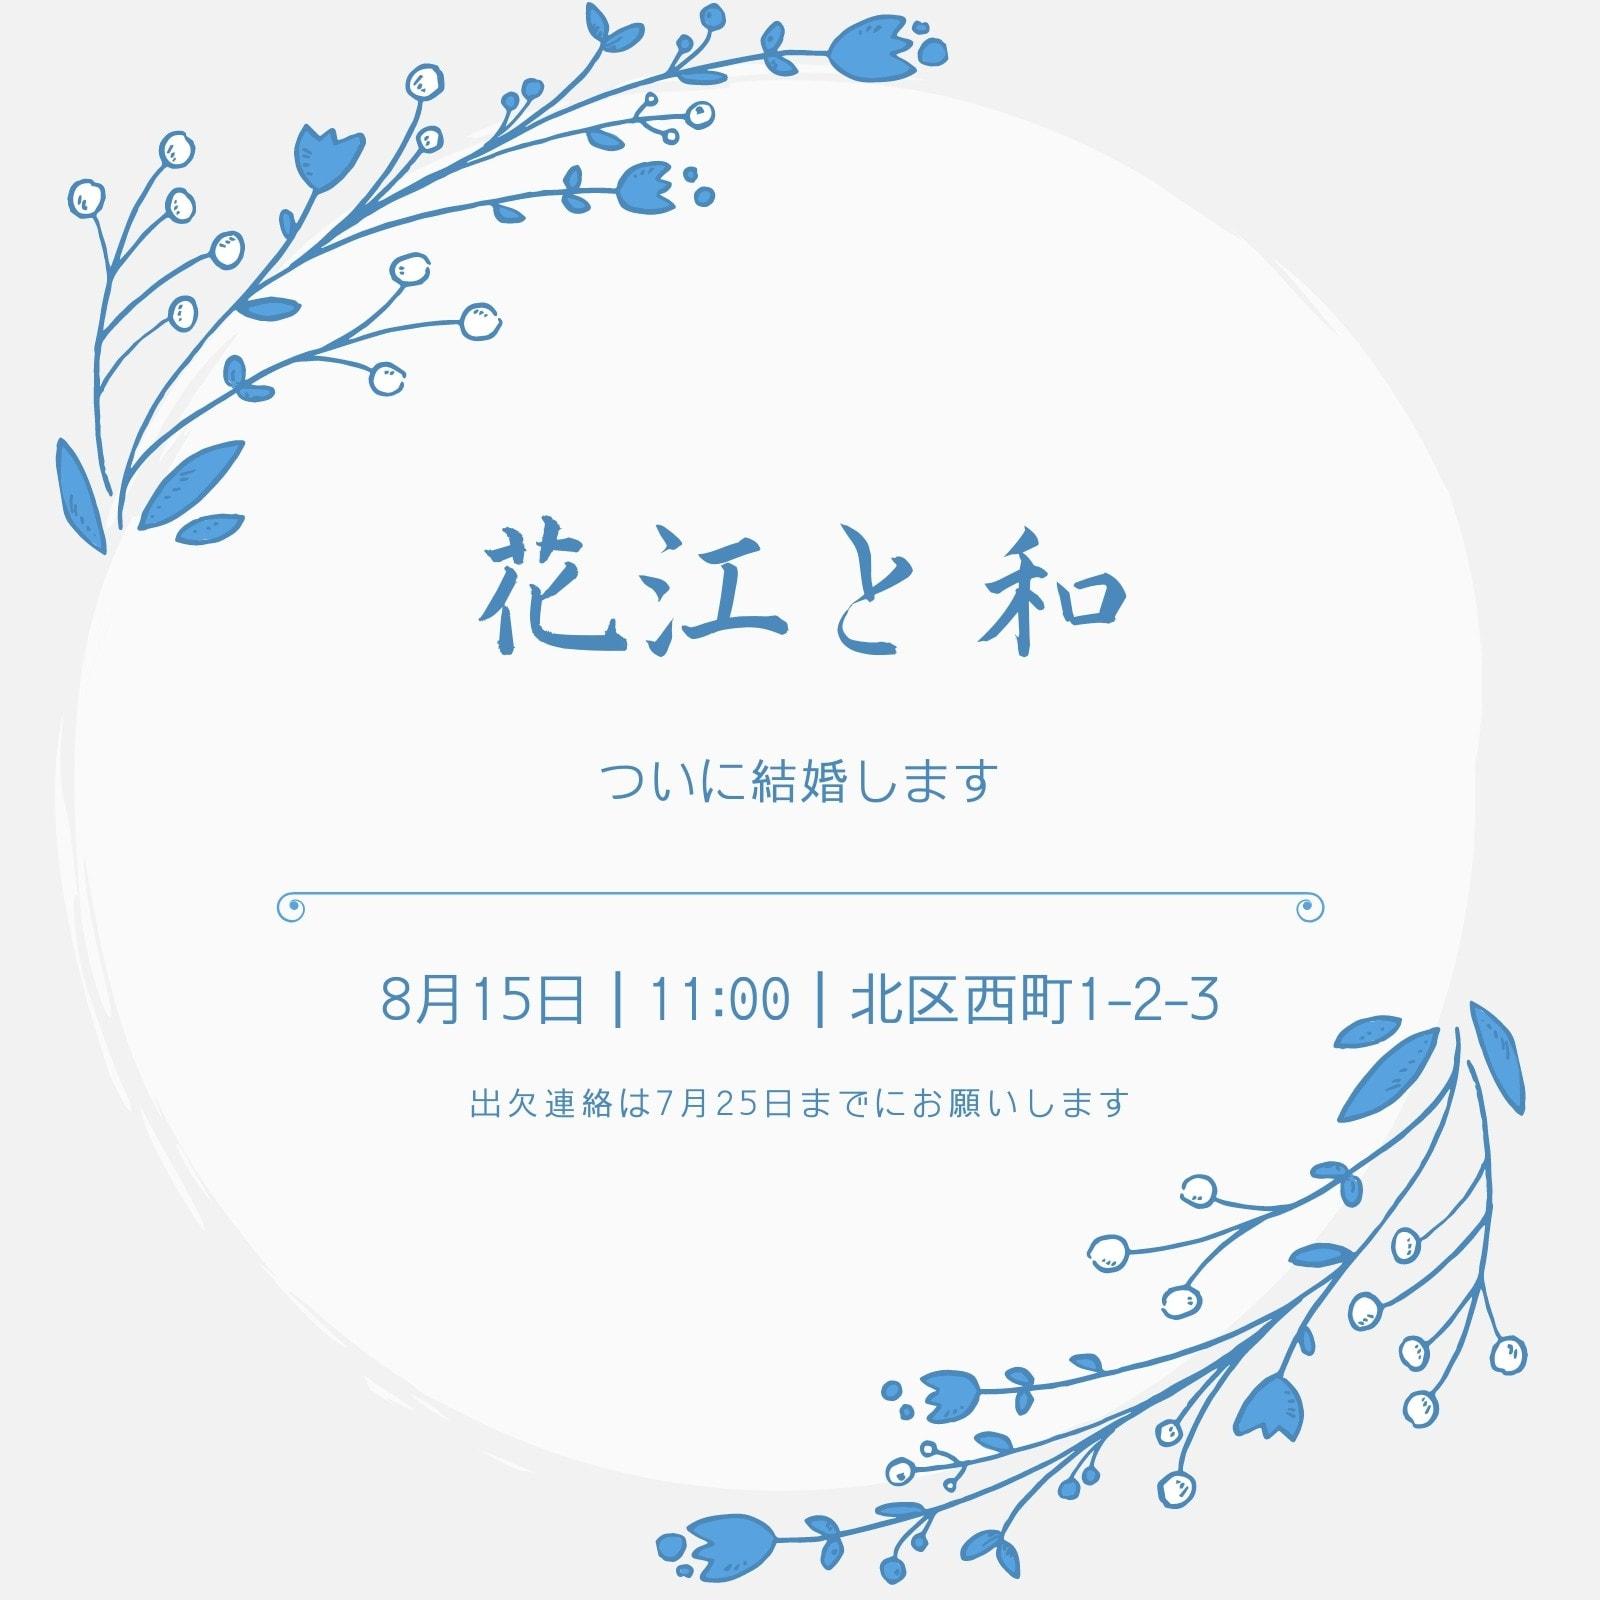 青と白 花柄 凸版印刷 結婚式の招待状